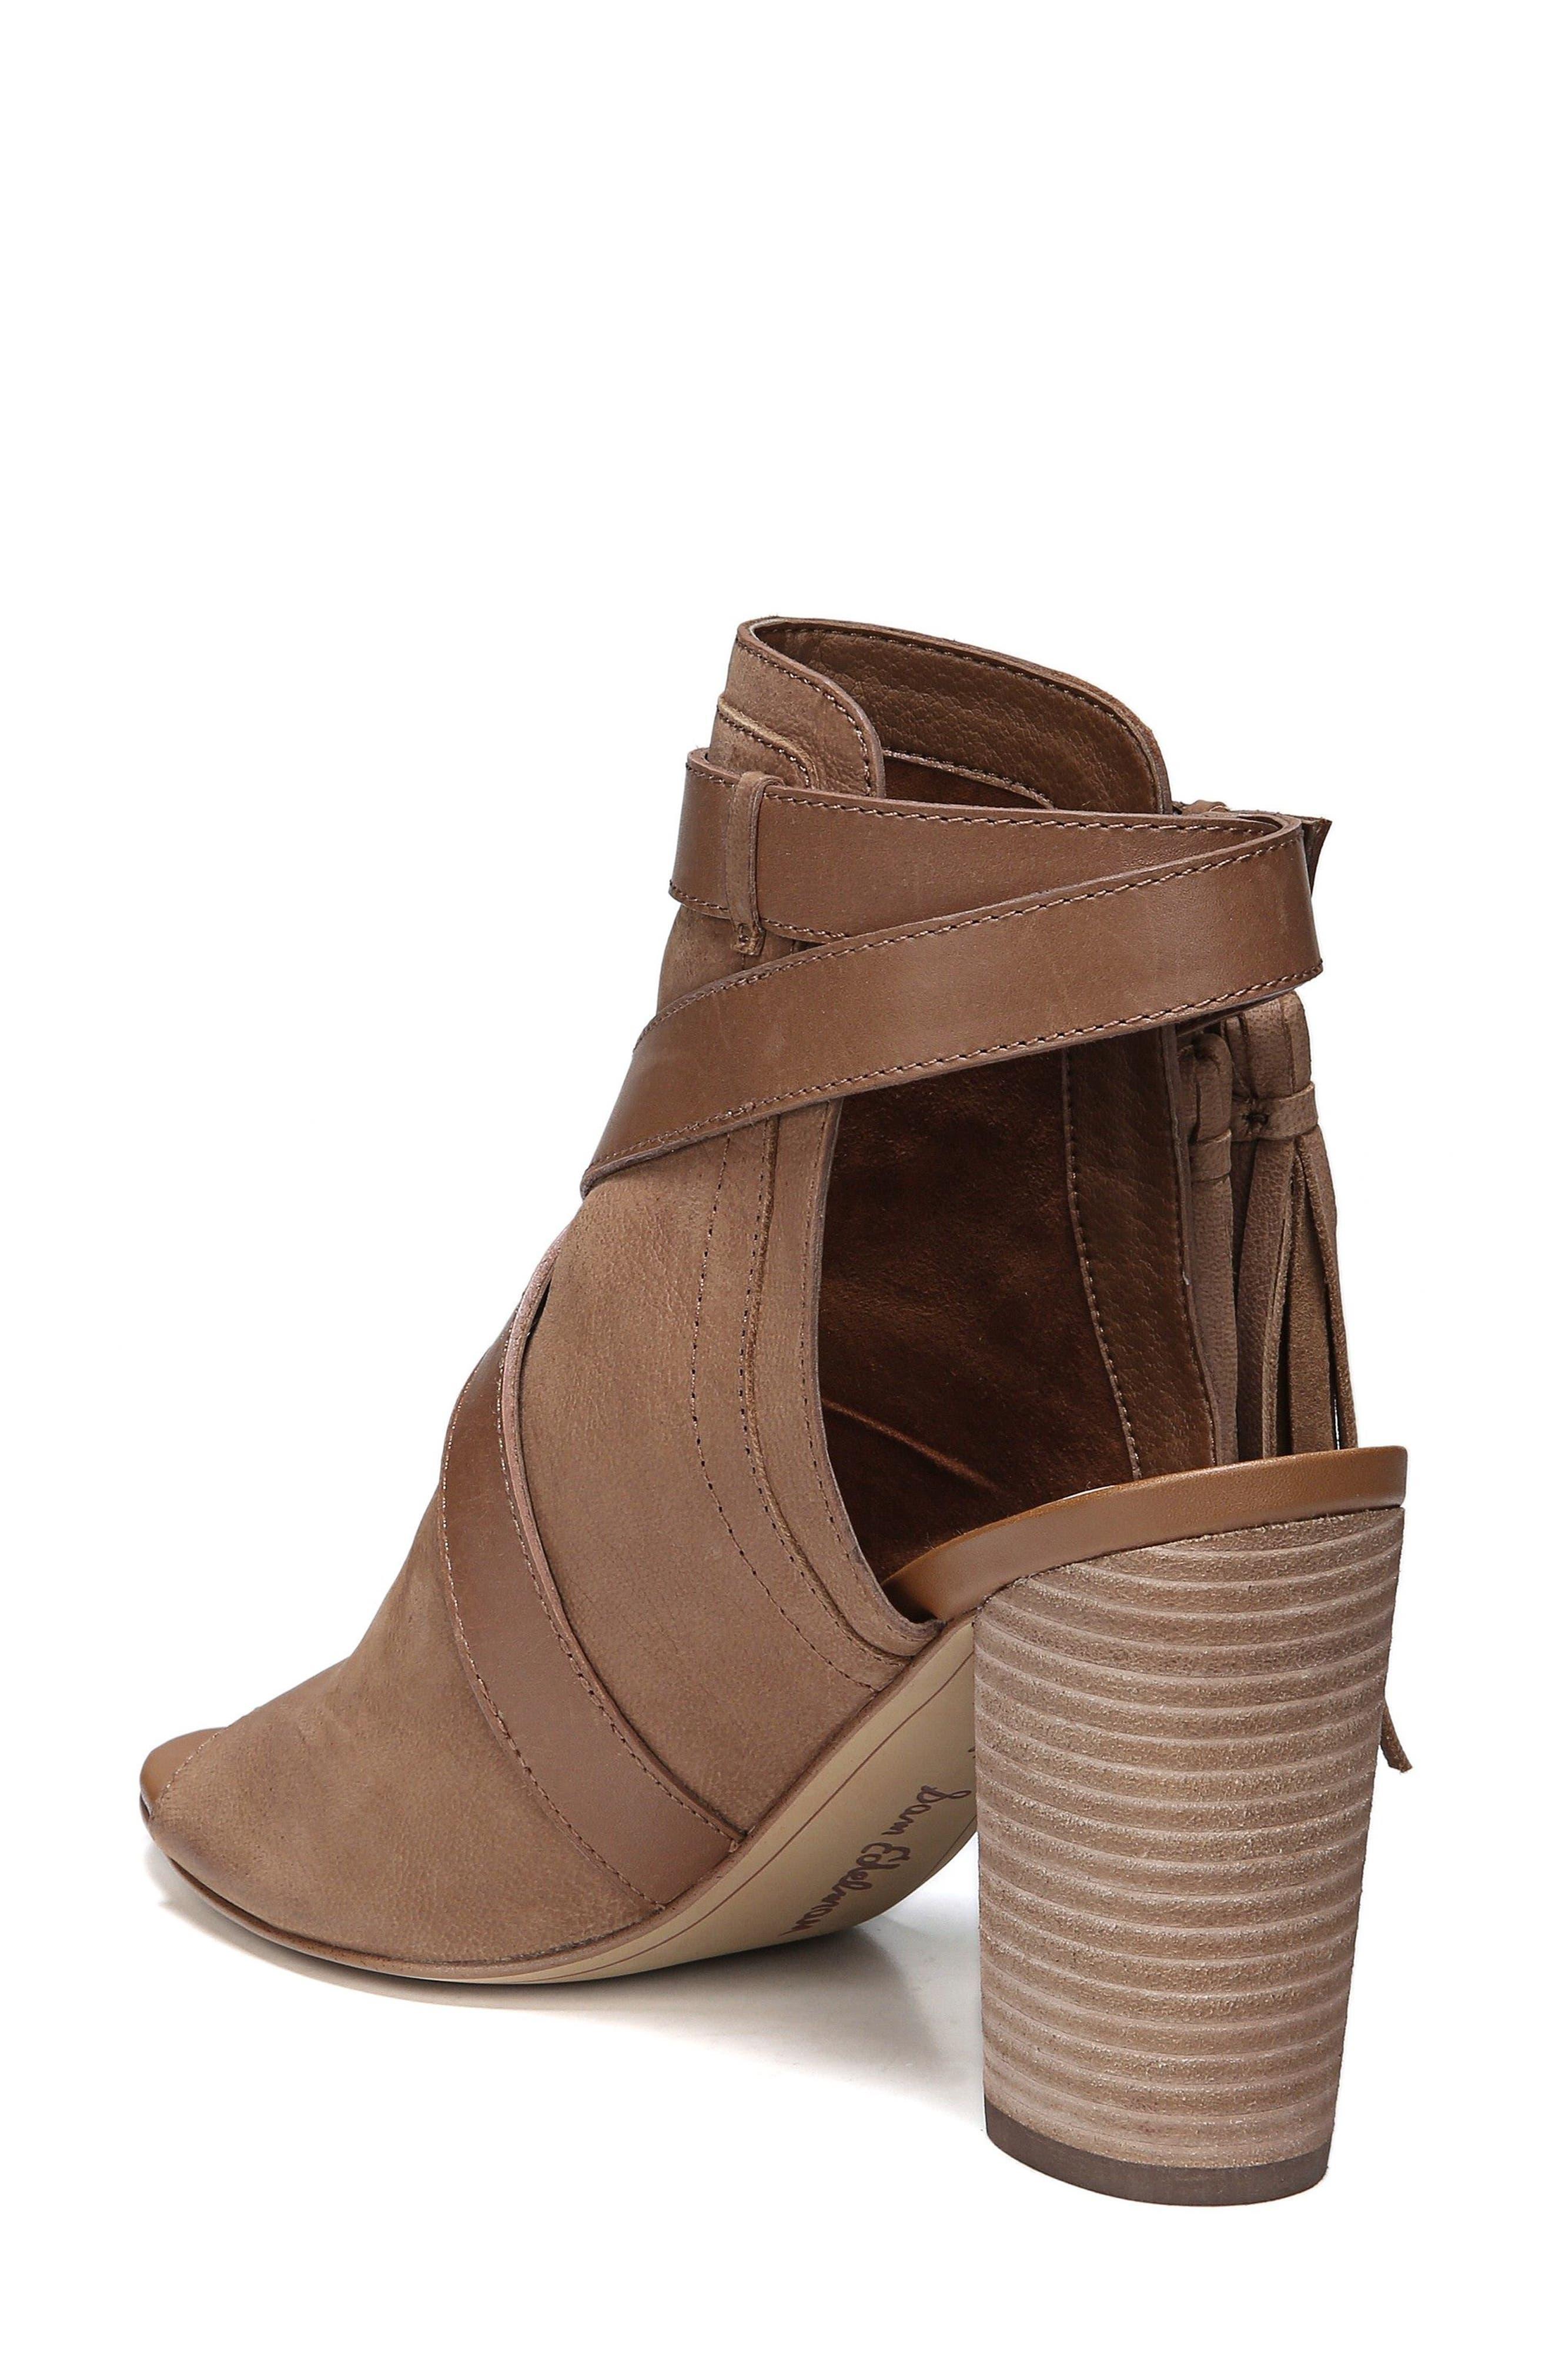 Vermont Block Heel Sandal,                             Alternate thumbnail 2, color,                             Deep Saddle Nubuck Leather